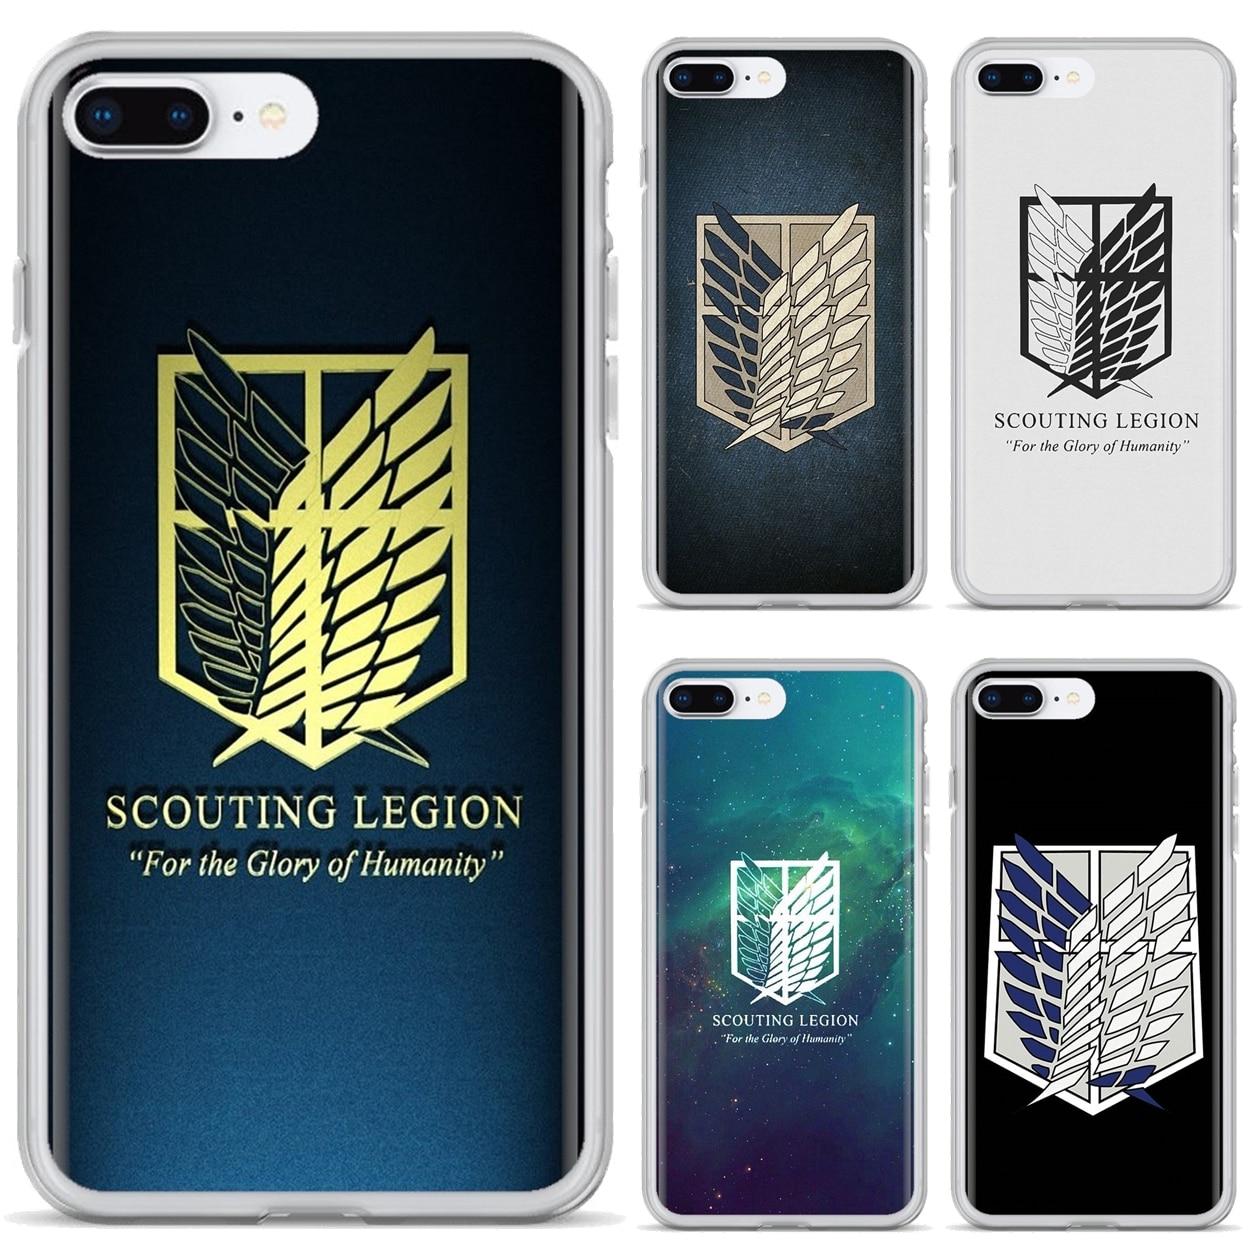 Мягкий чехол для Samsung Galaxy S6 S10E S10 Edge Lite Plus Core Grand Prime Alpha J1 mini attack on titan scuting Legion